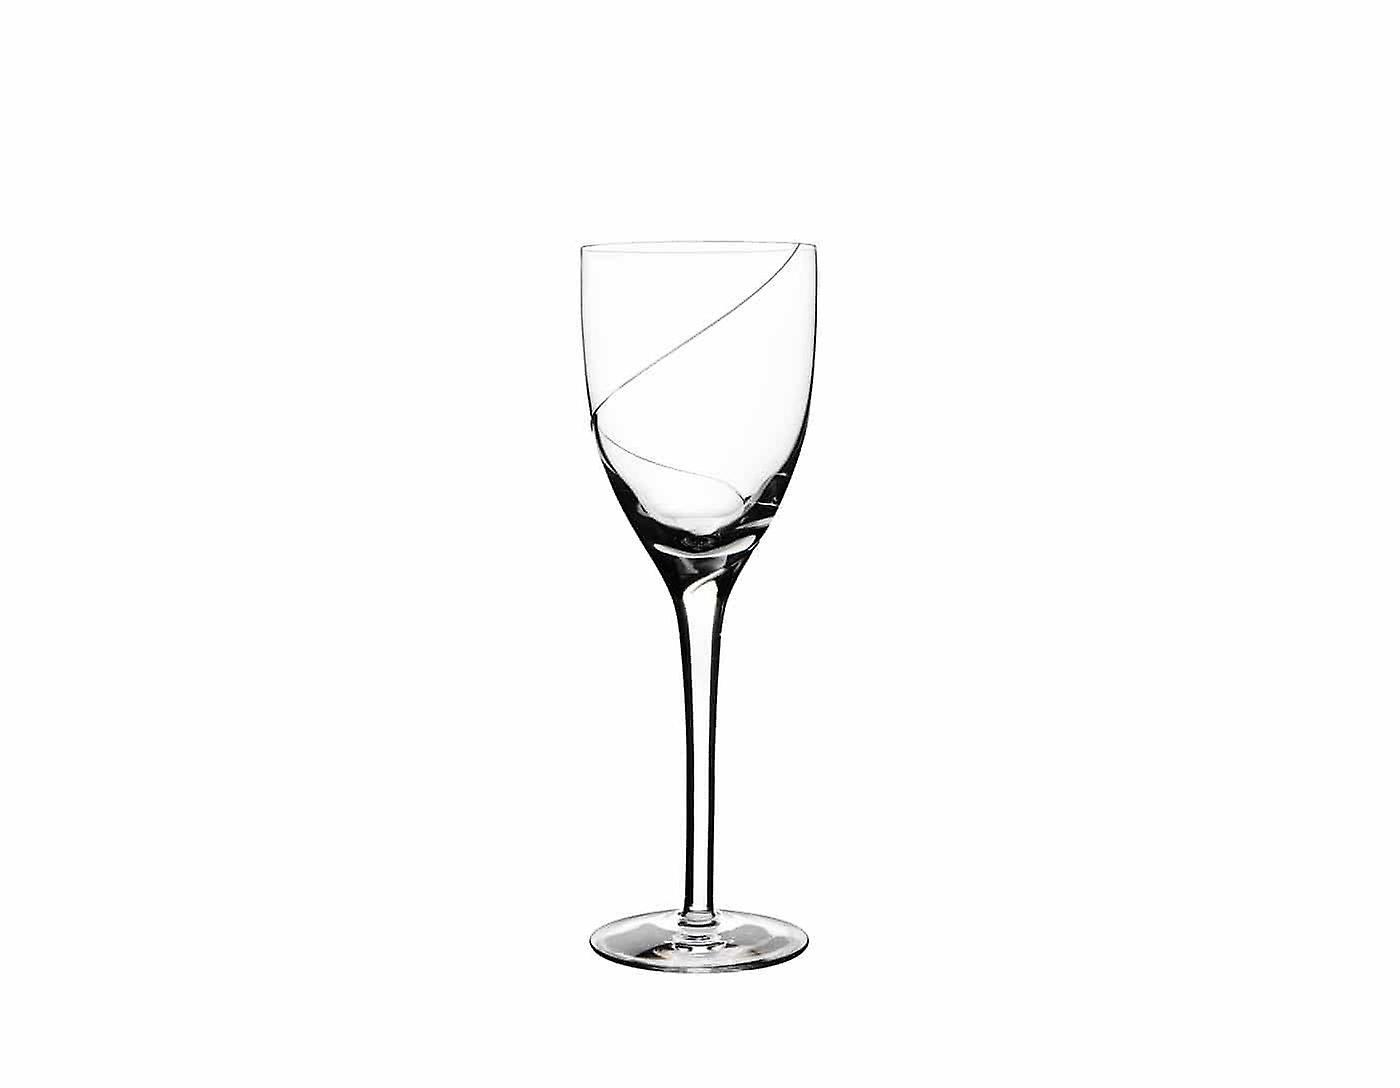 Kosta Boda - 6 st LINE - VIN 28 CL Design Anna Ehrner - Nytt från glasprinsen